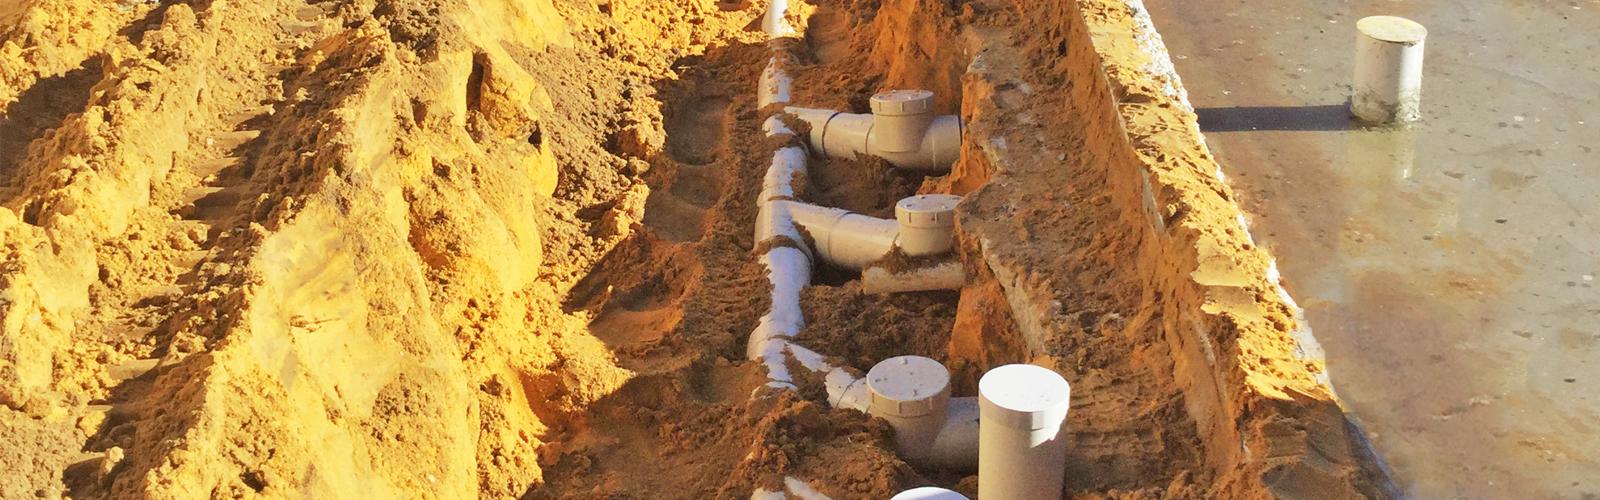 Drainage plumbing diagrams